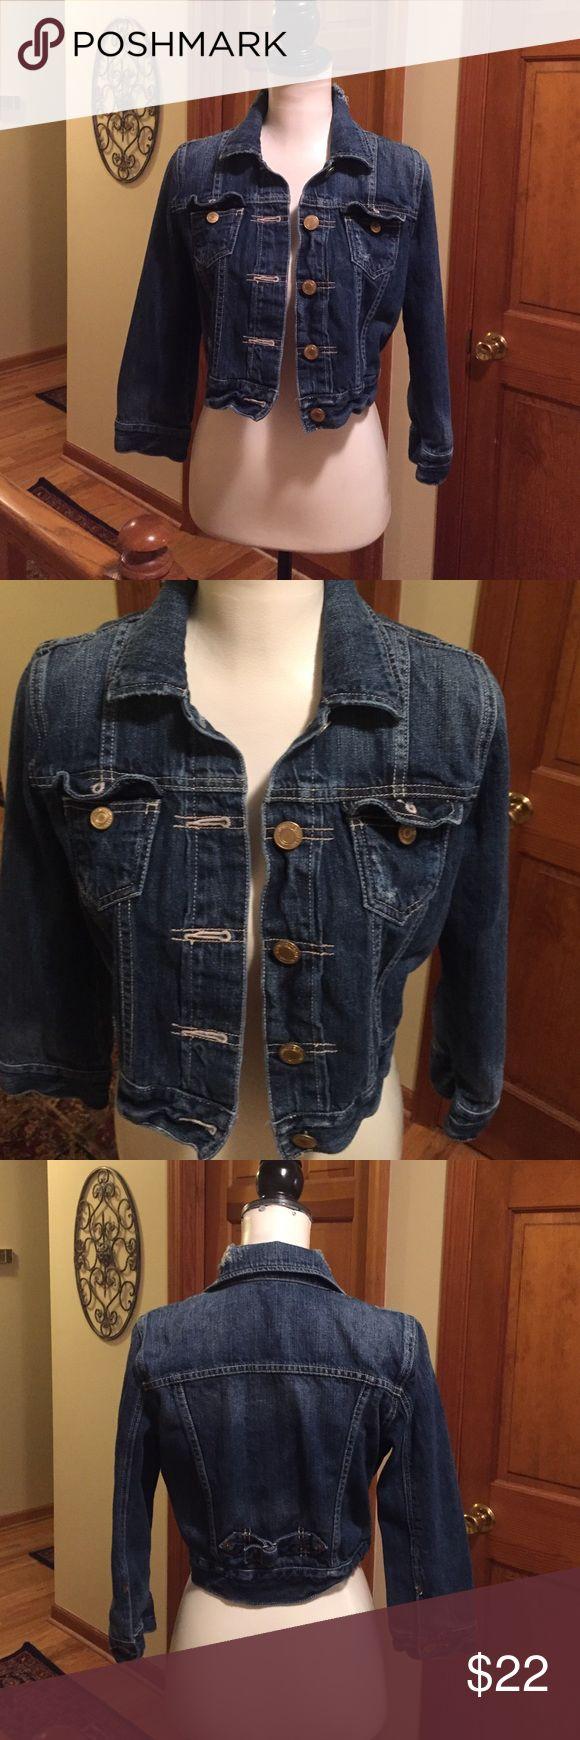 SUPER CUTE & TRENDY American Eagle denim jacket American Eagle denim jacket - stressed prewashed look - SUPER CUTE & TRENDY! American Eagle Jackets & Coats Jean Jackets